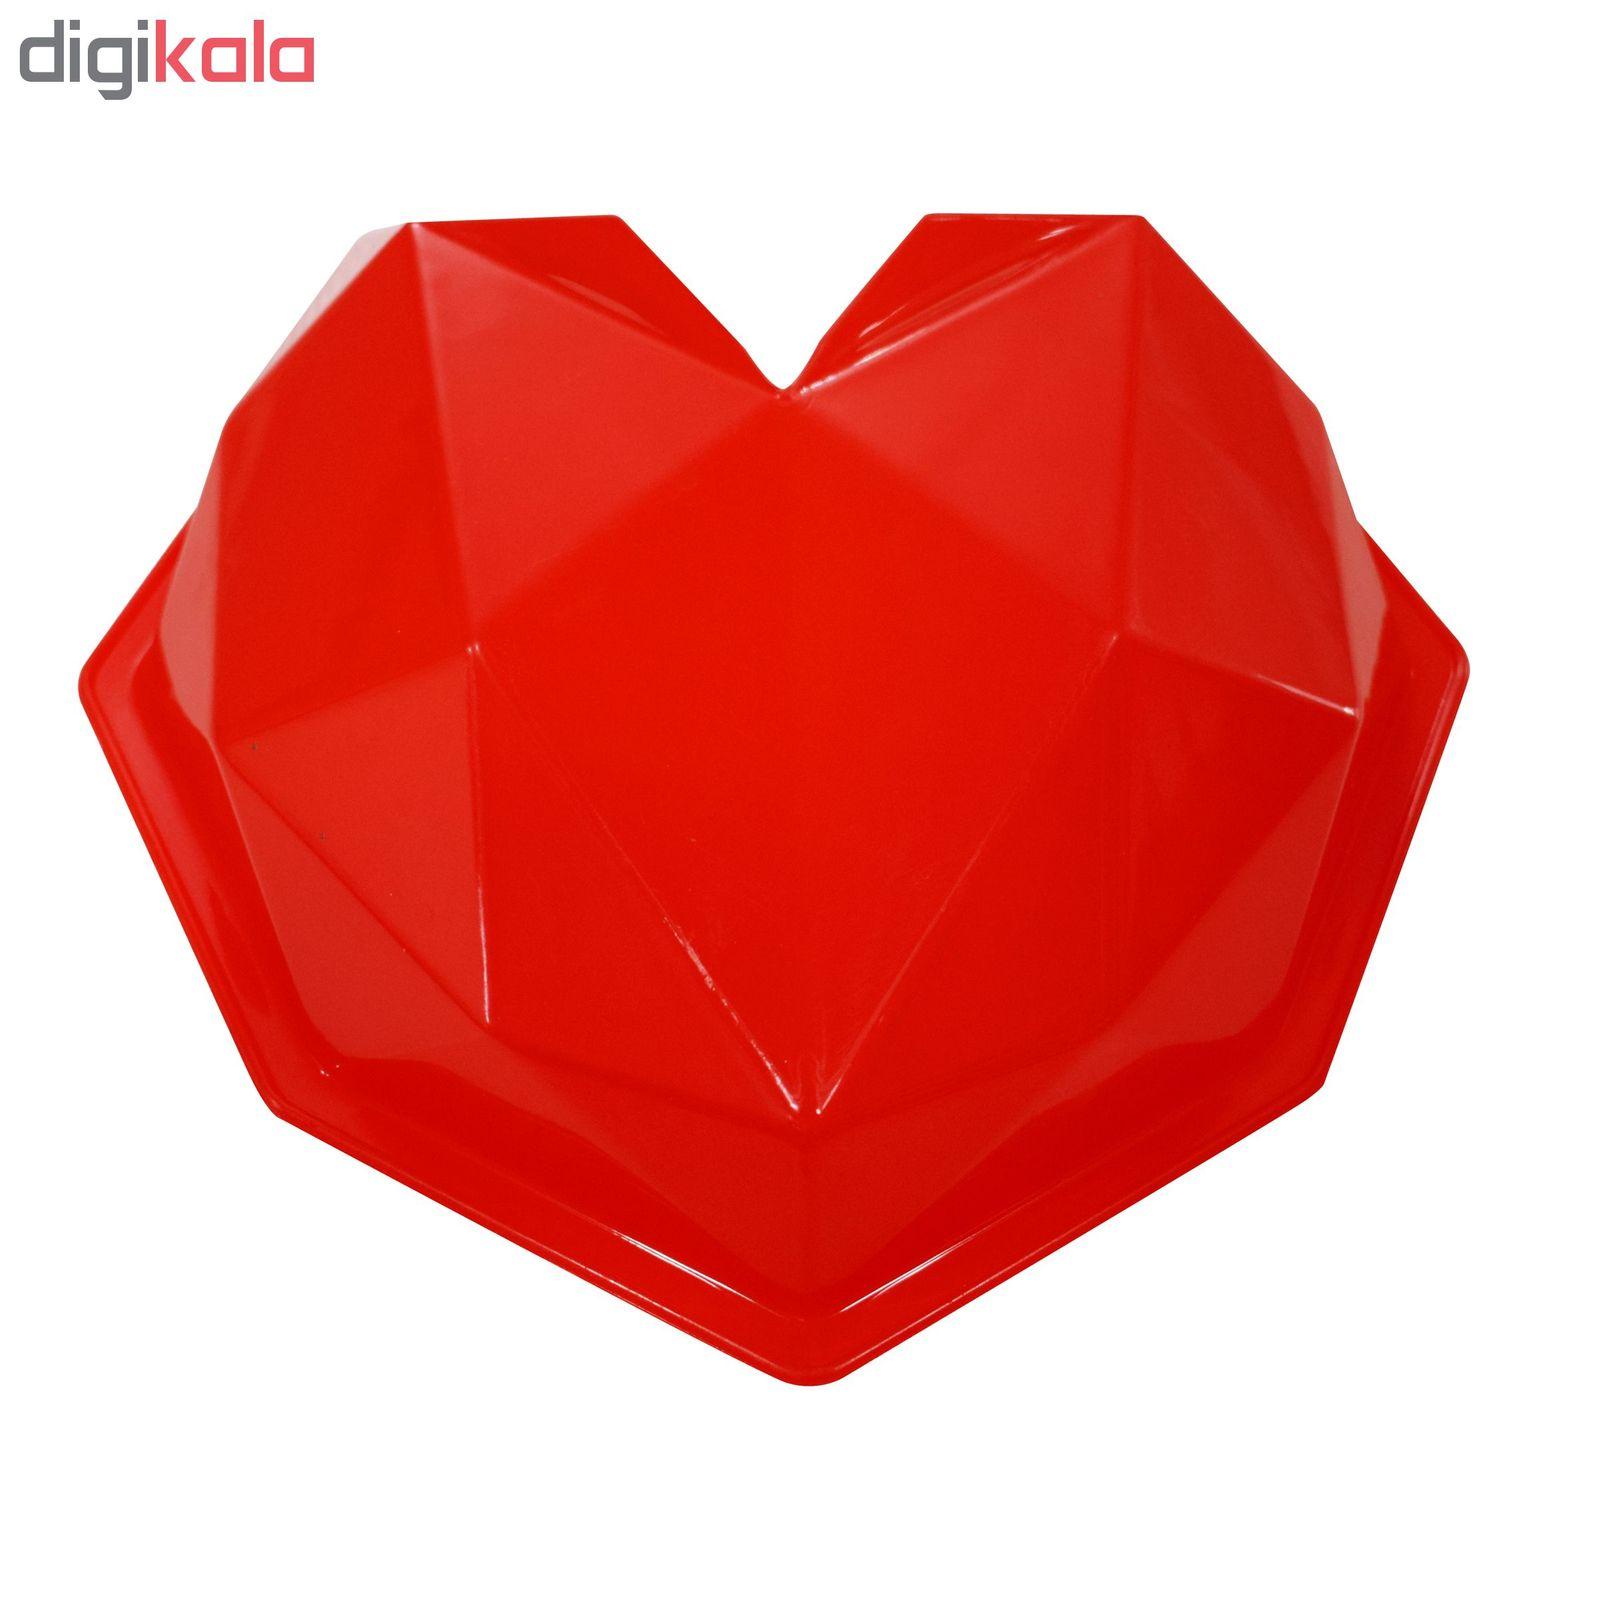 قالب ژله طرح قلب کد 02 main 1 1